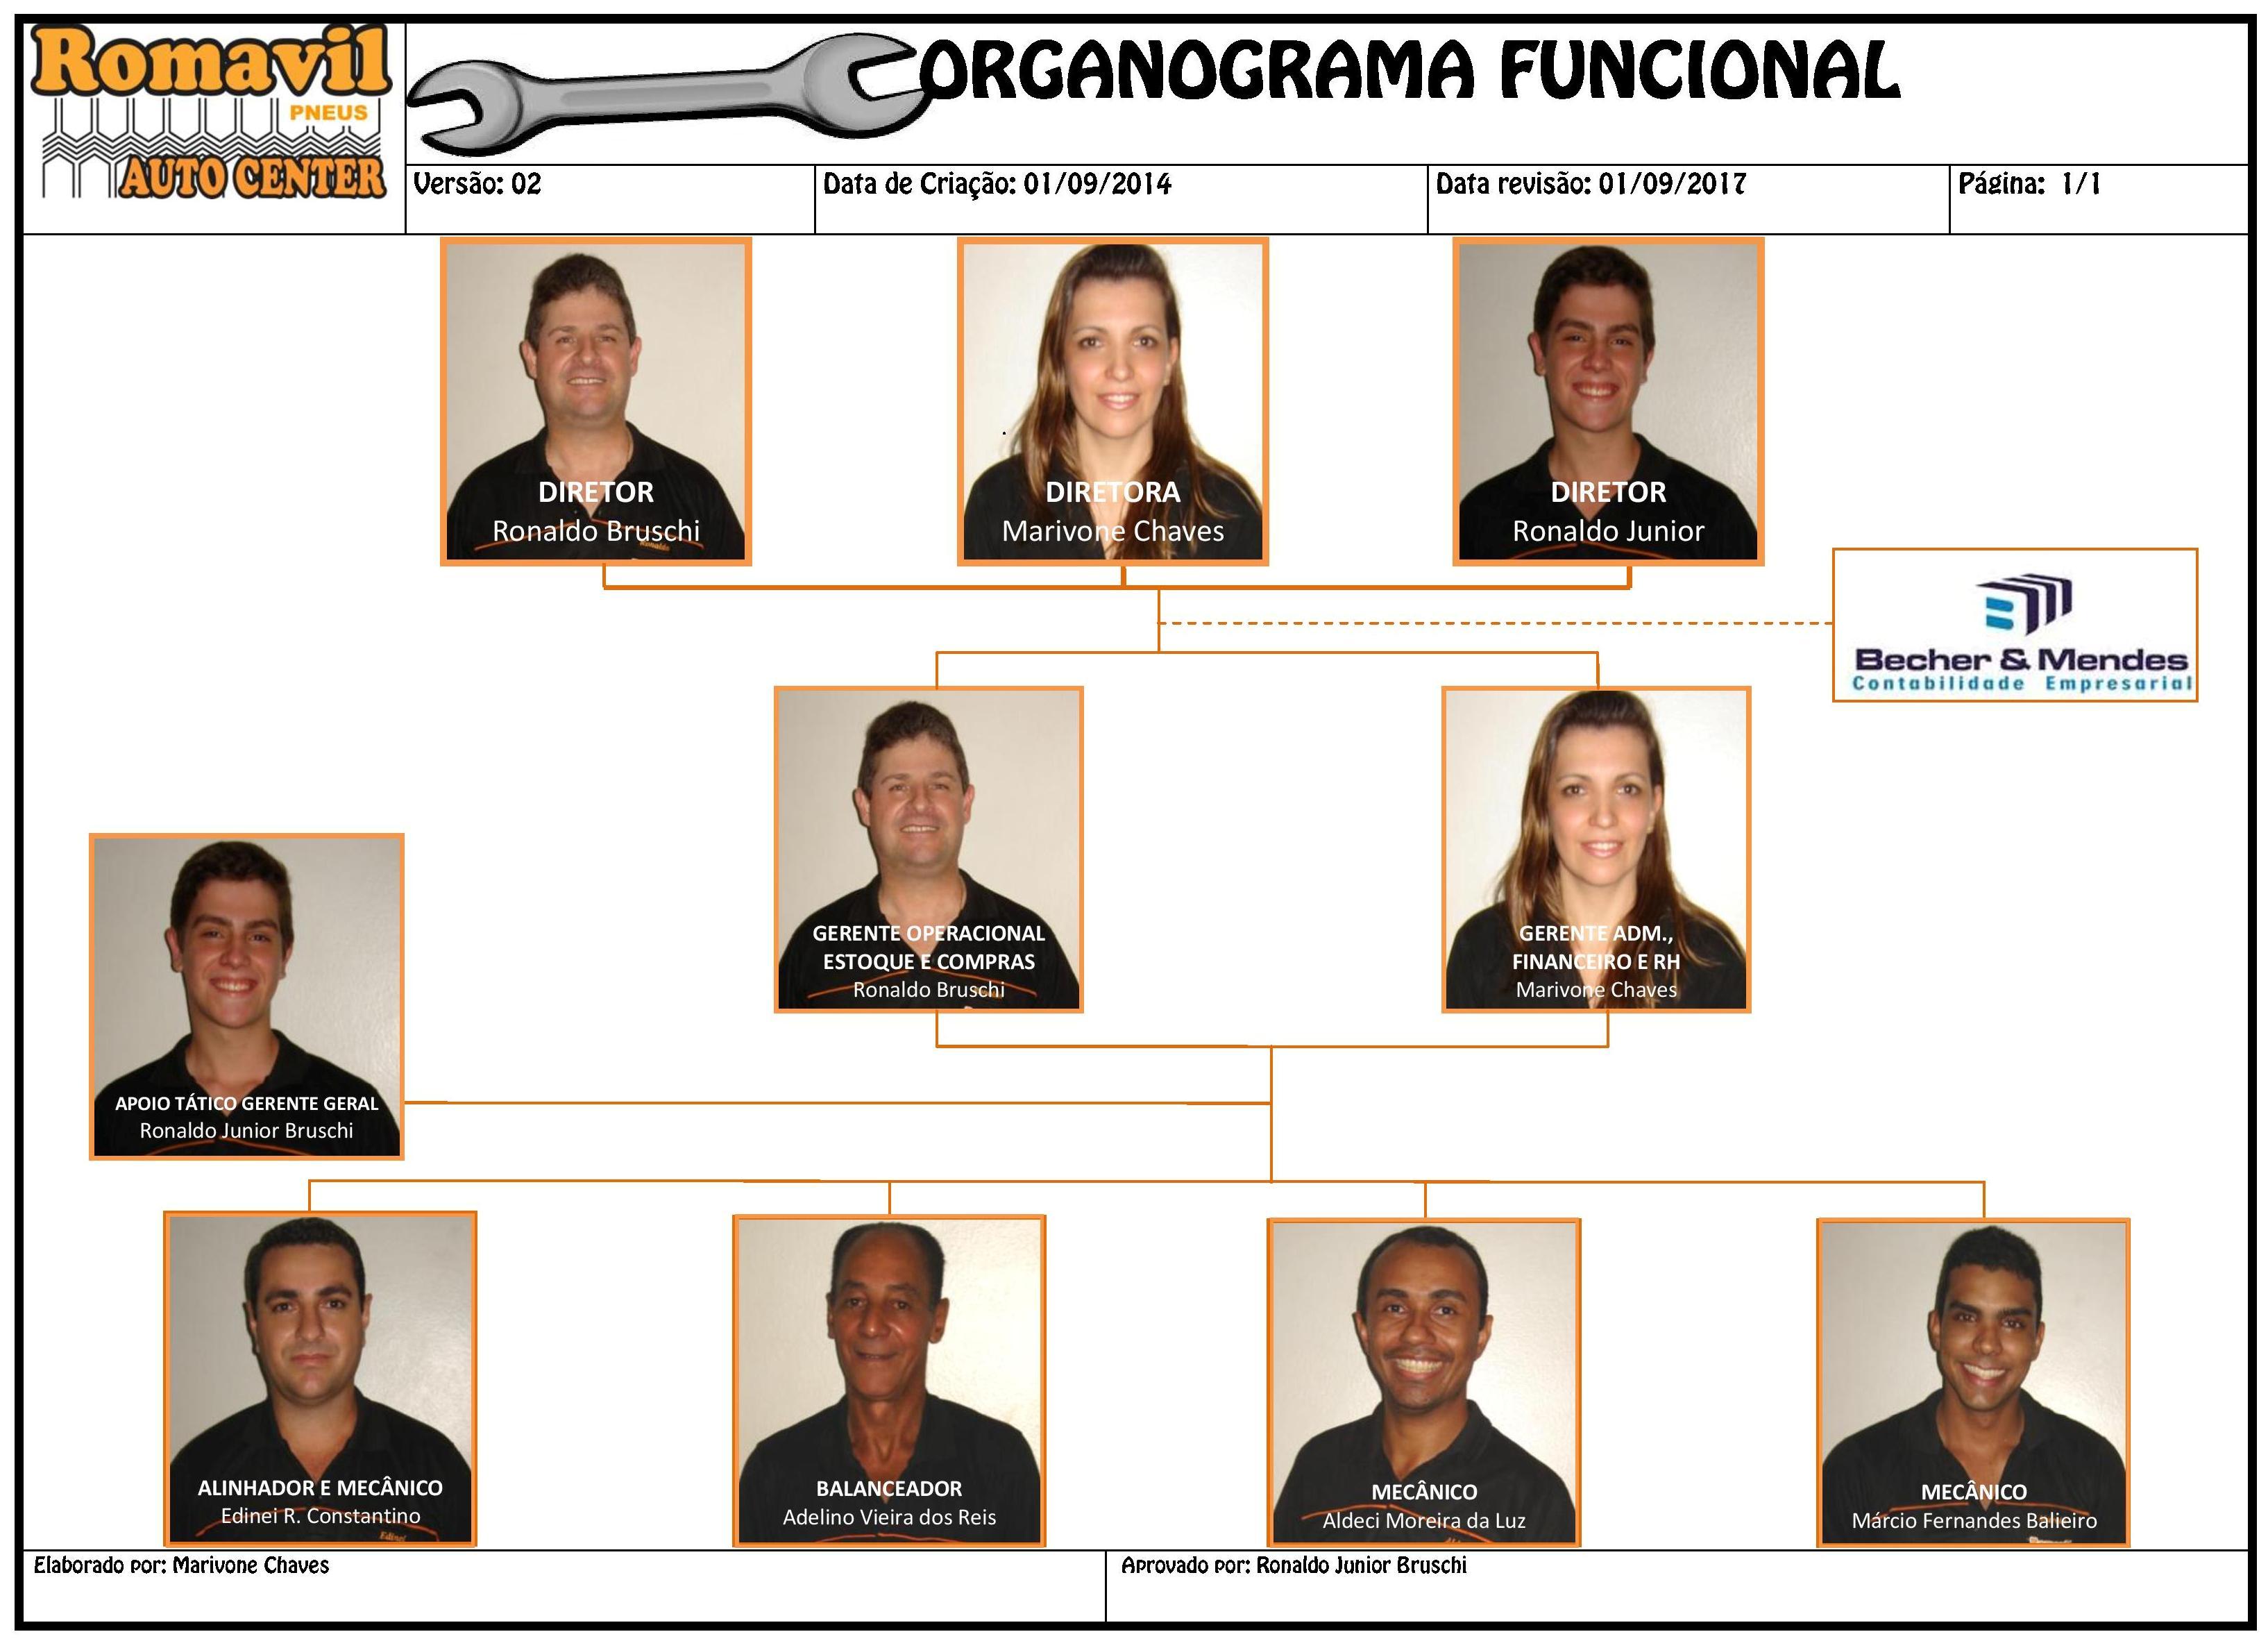 Organograma Funcional Romavil Fotos4-page-001